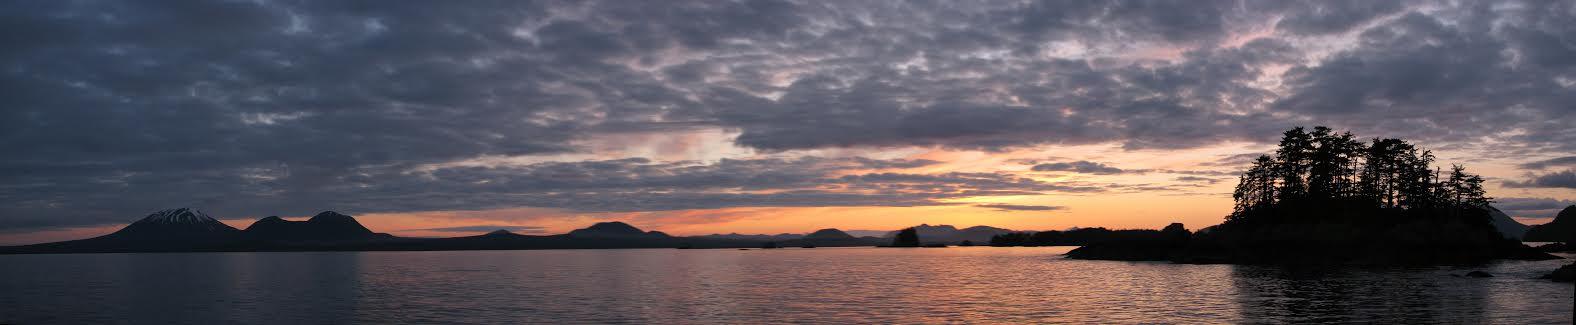 Sitka Conservation Society Scenery